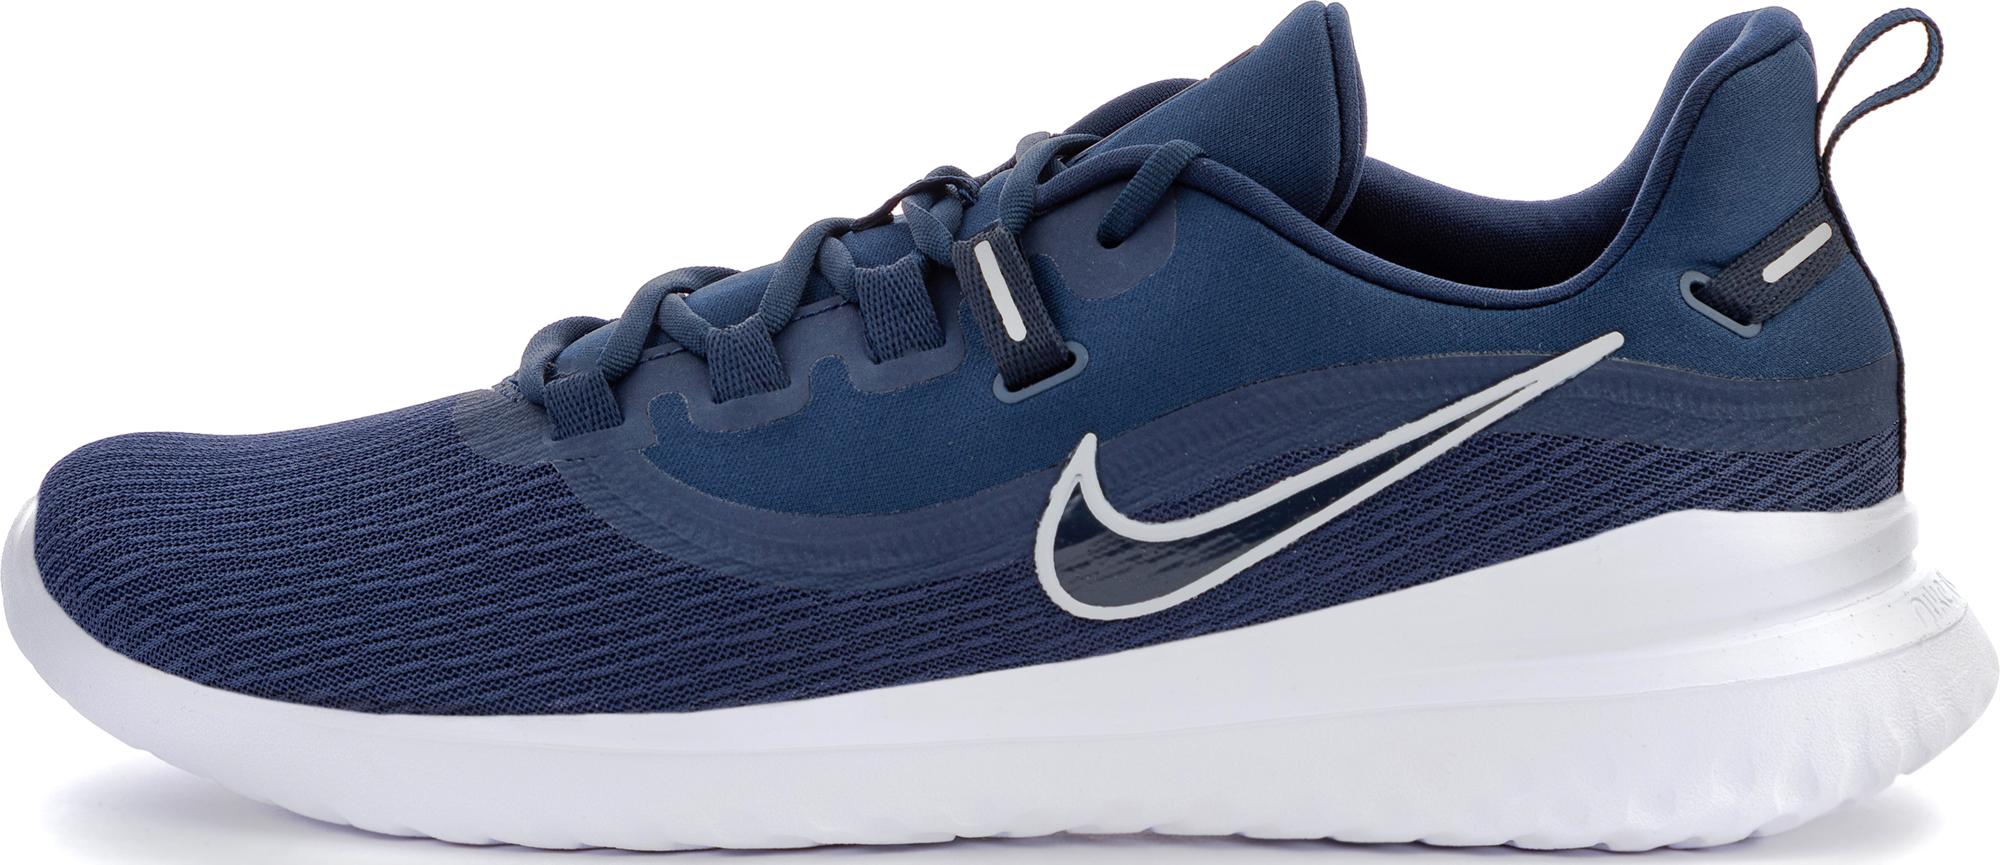 Nike Кроссовки мужские Renew Rival 2, размер 45